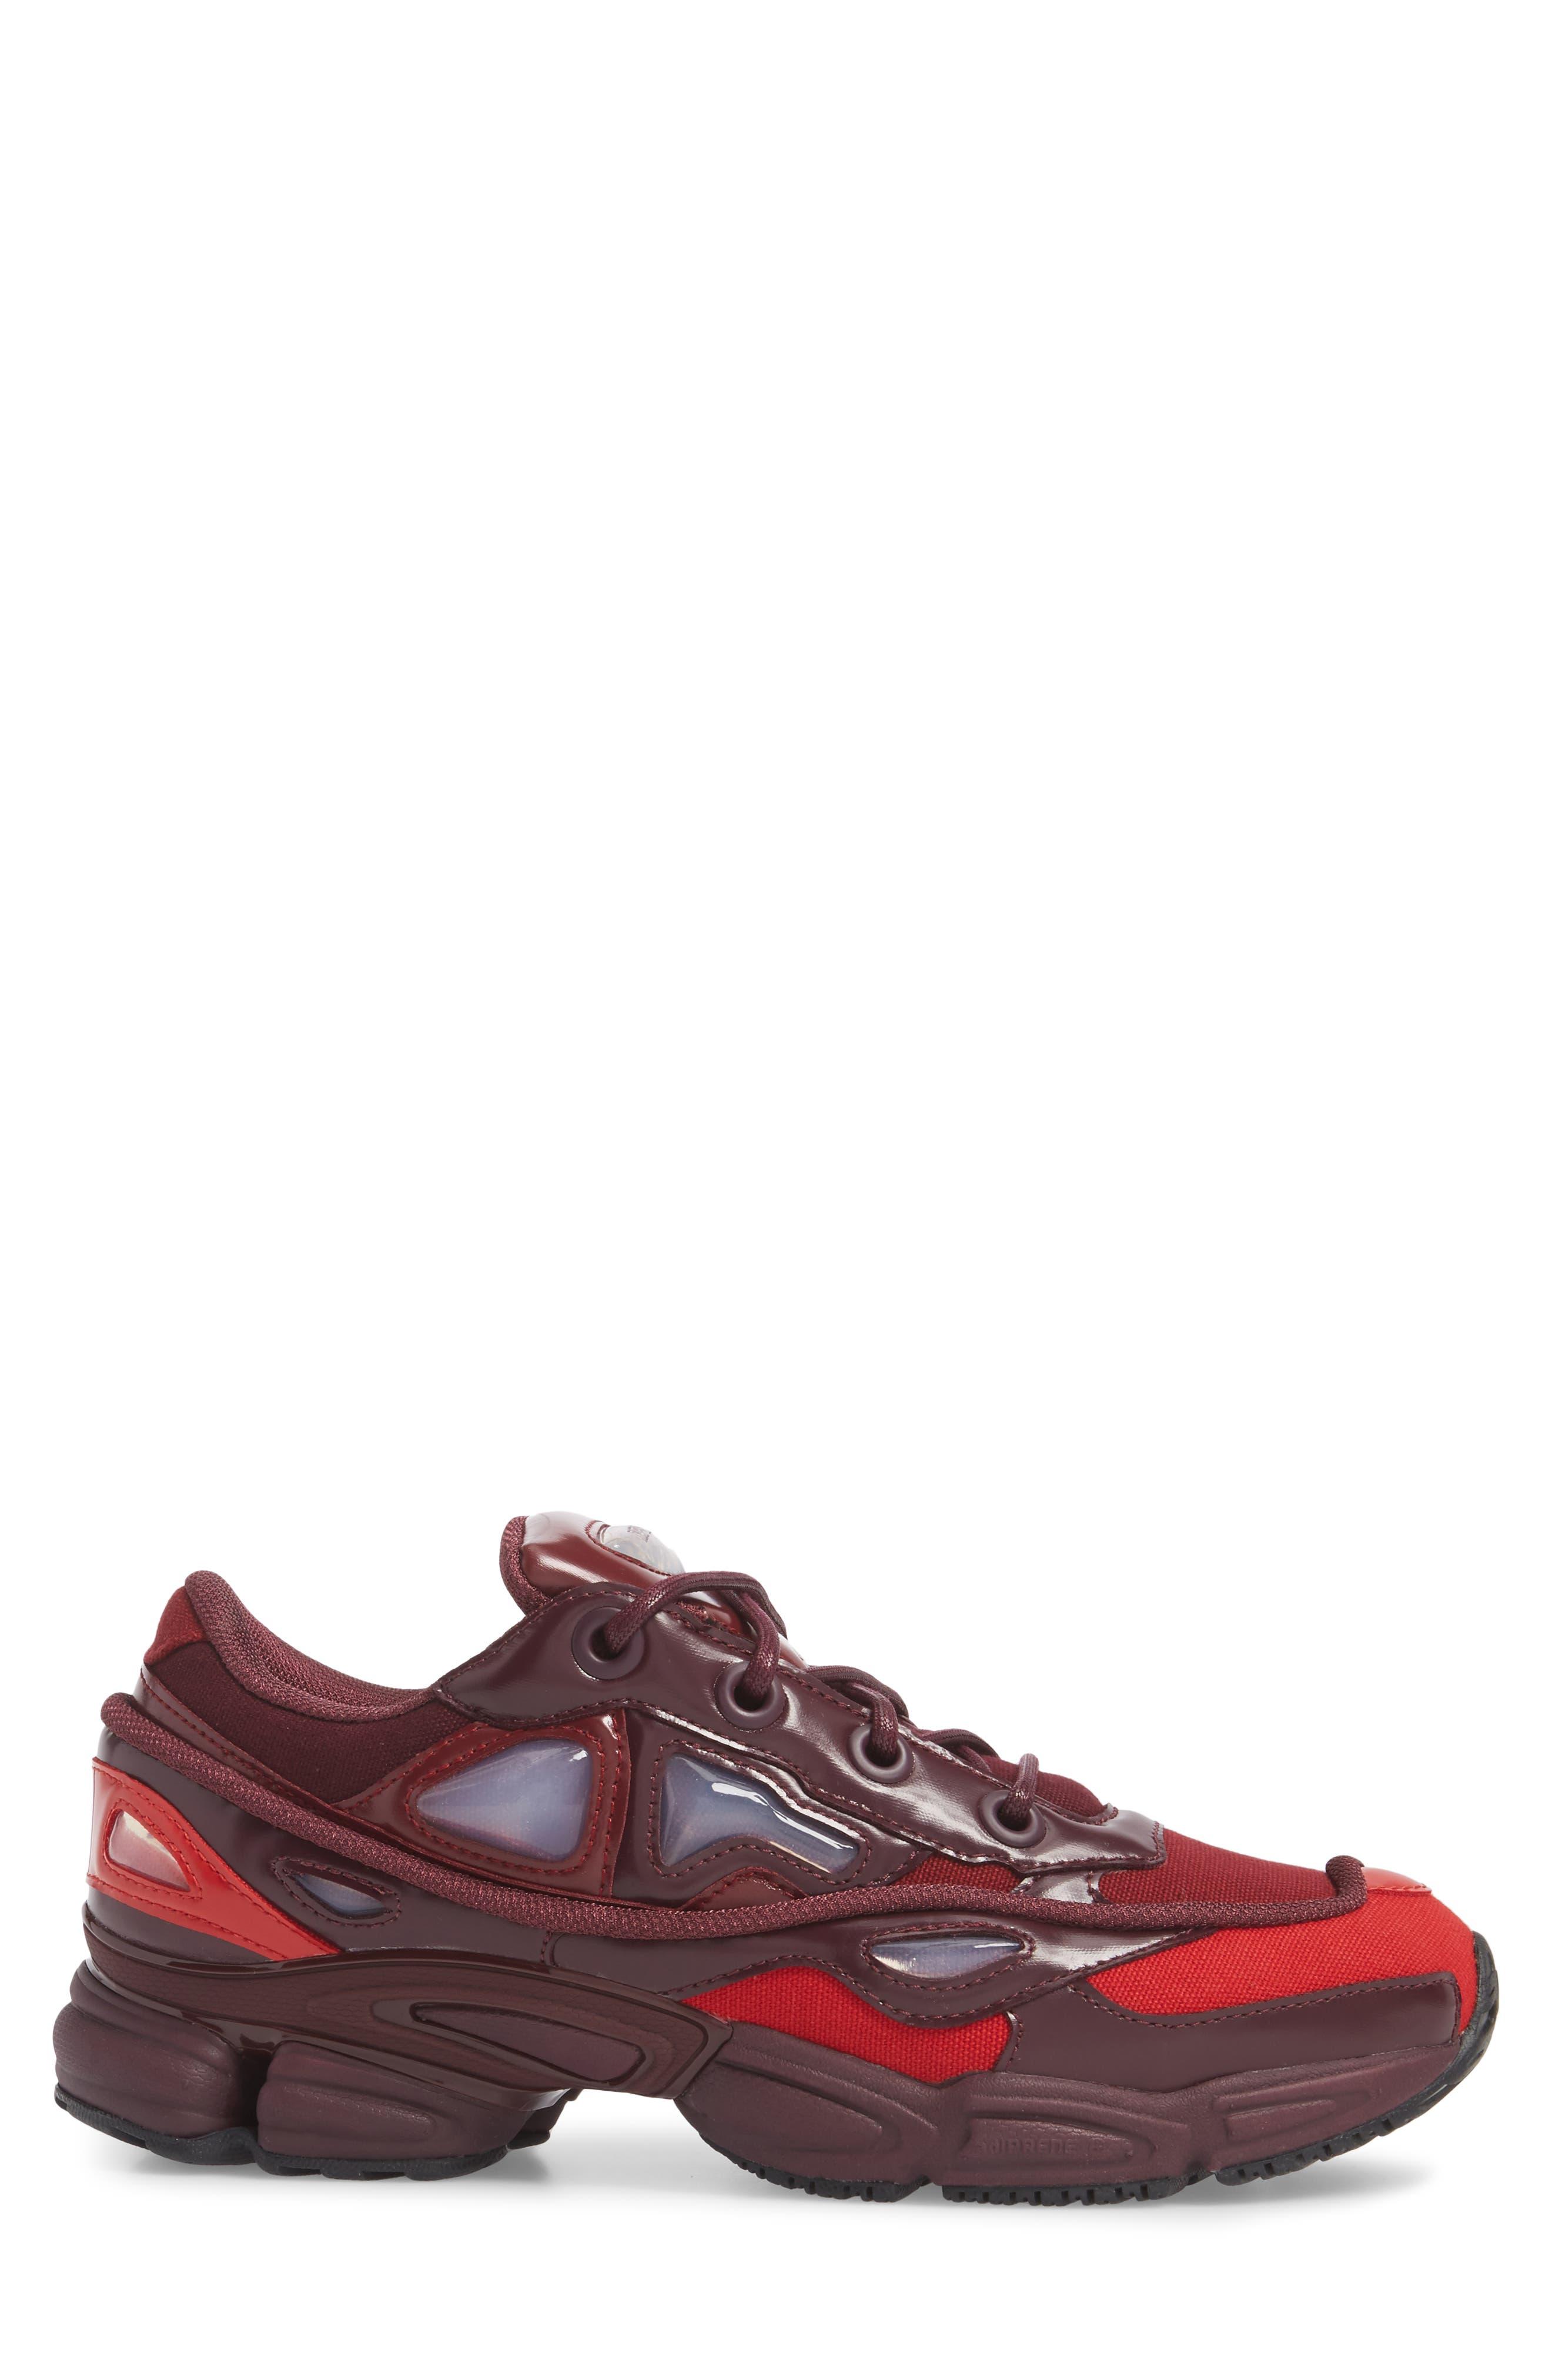 adidas by Raf Simons Ozweego III Sneaker,                             Alternate thumbnail 3, color,                             Burgundy/ Maroon/ Scarlet